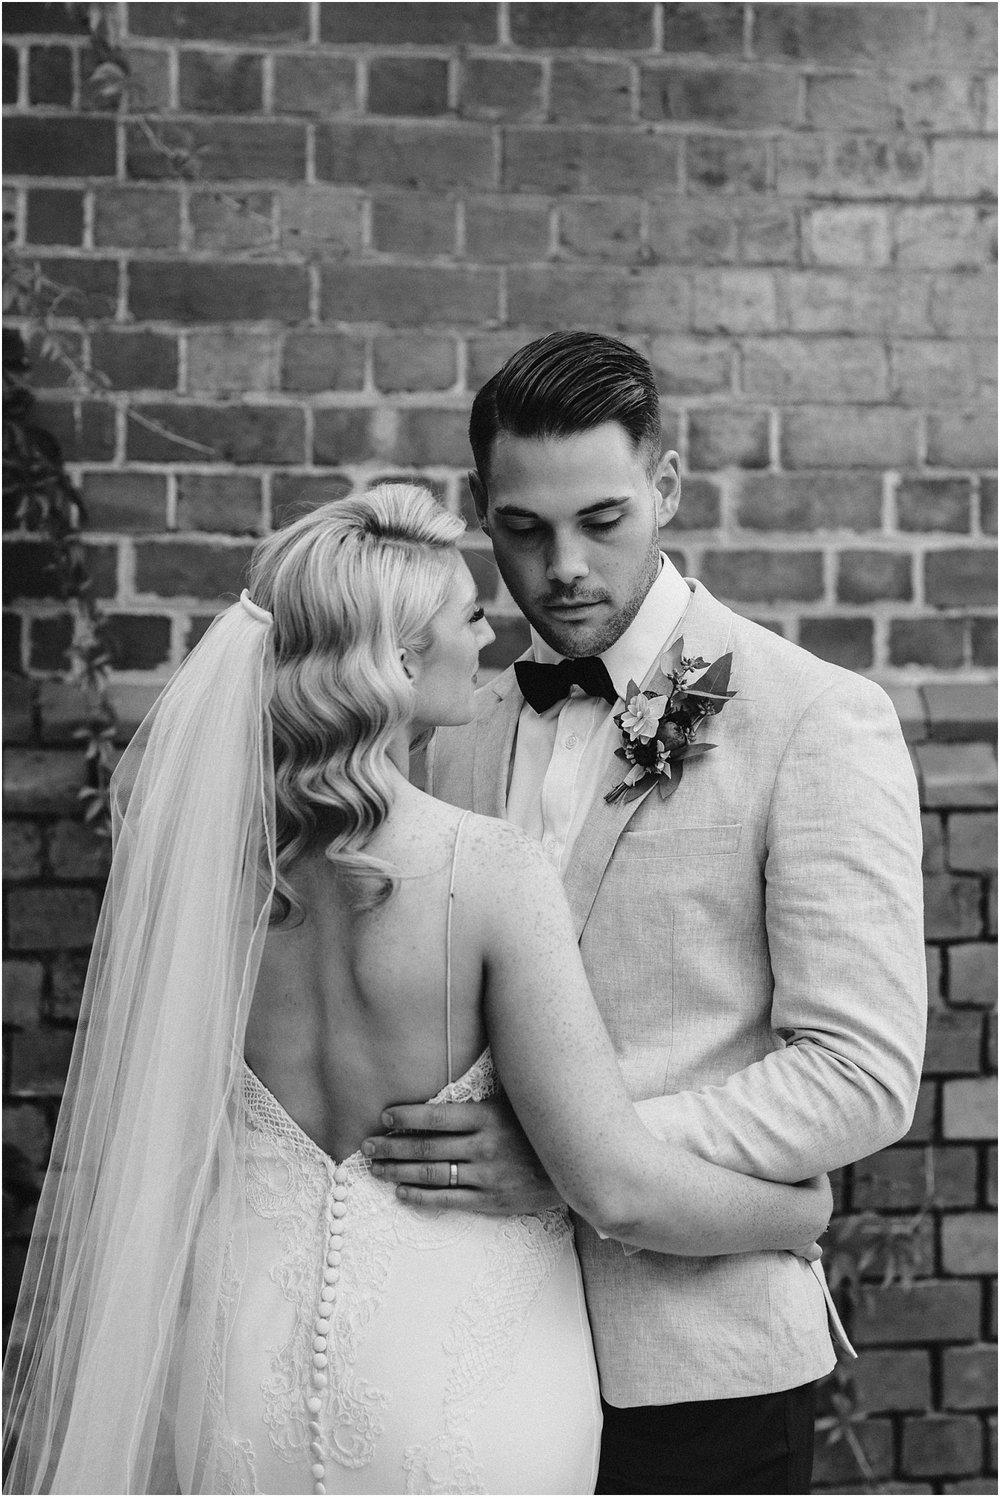 Katherine and Sam's stylish elopment at the Euroa Butter Factory._0068.jpg